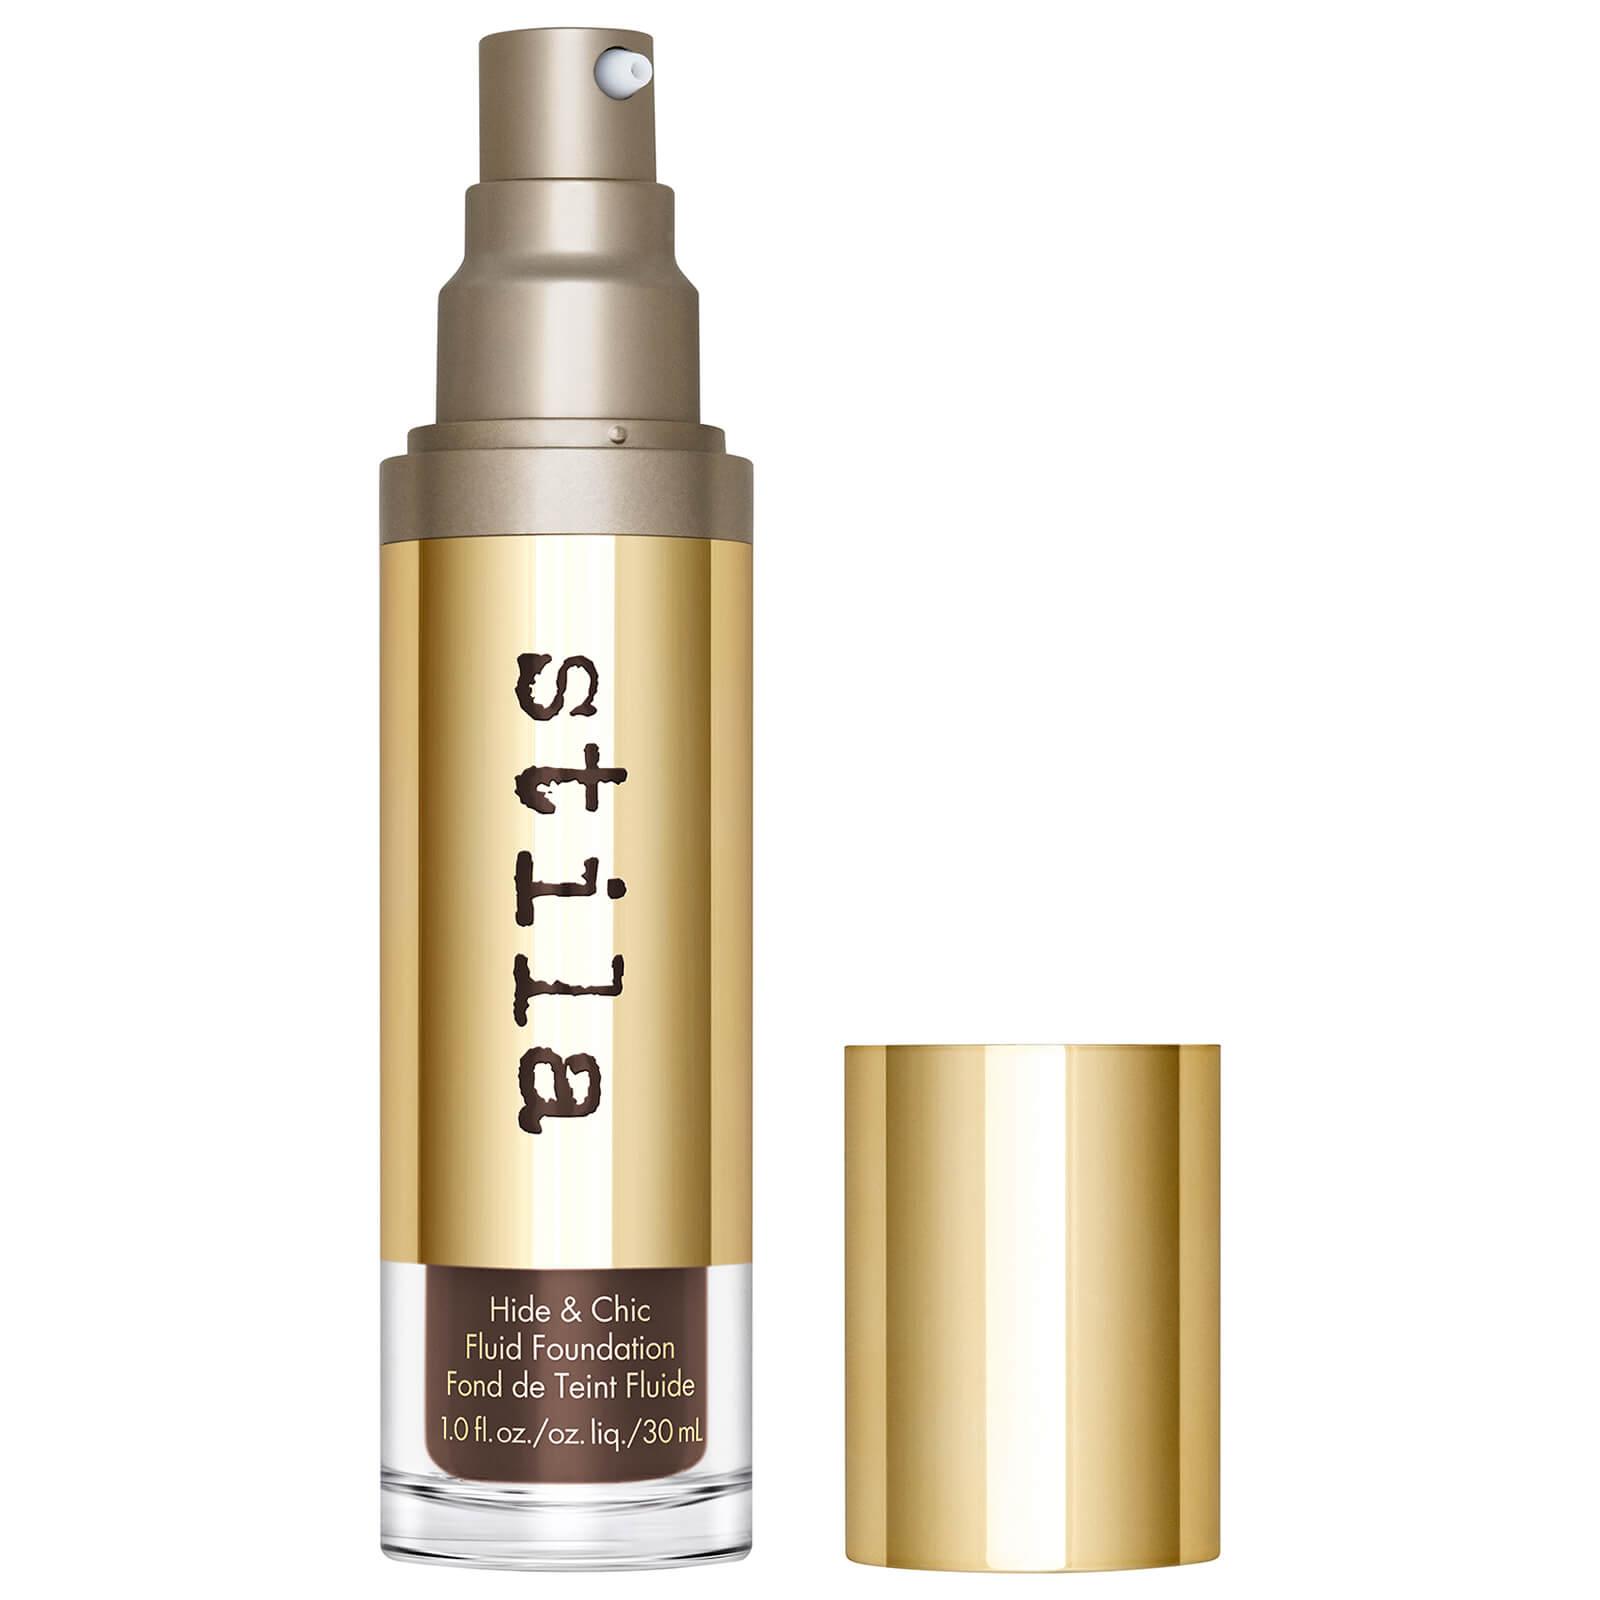 Купить Stila Hide and Chic Fluid Foundation 30ml (Various Shades) - Deep 6